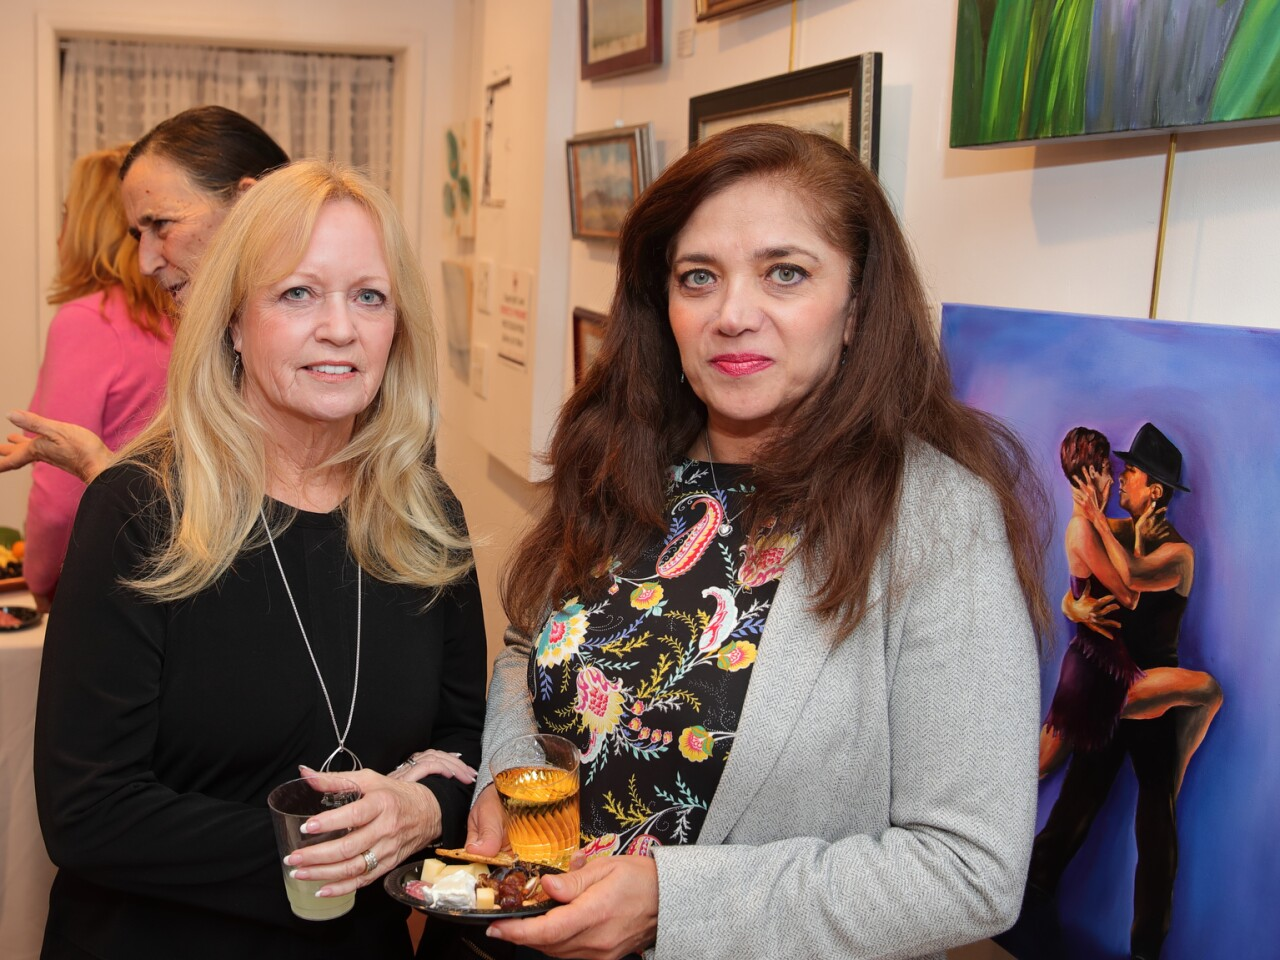 Artists Pam Linton and Sholeh Ashtiani